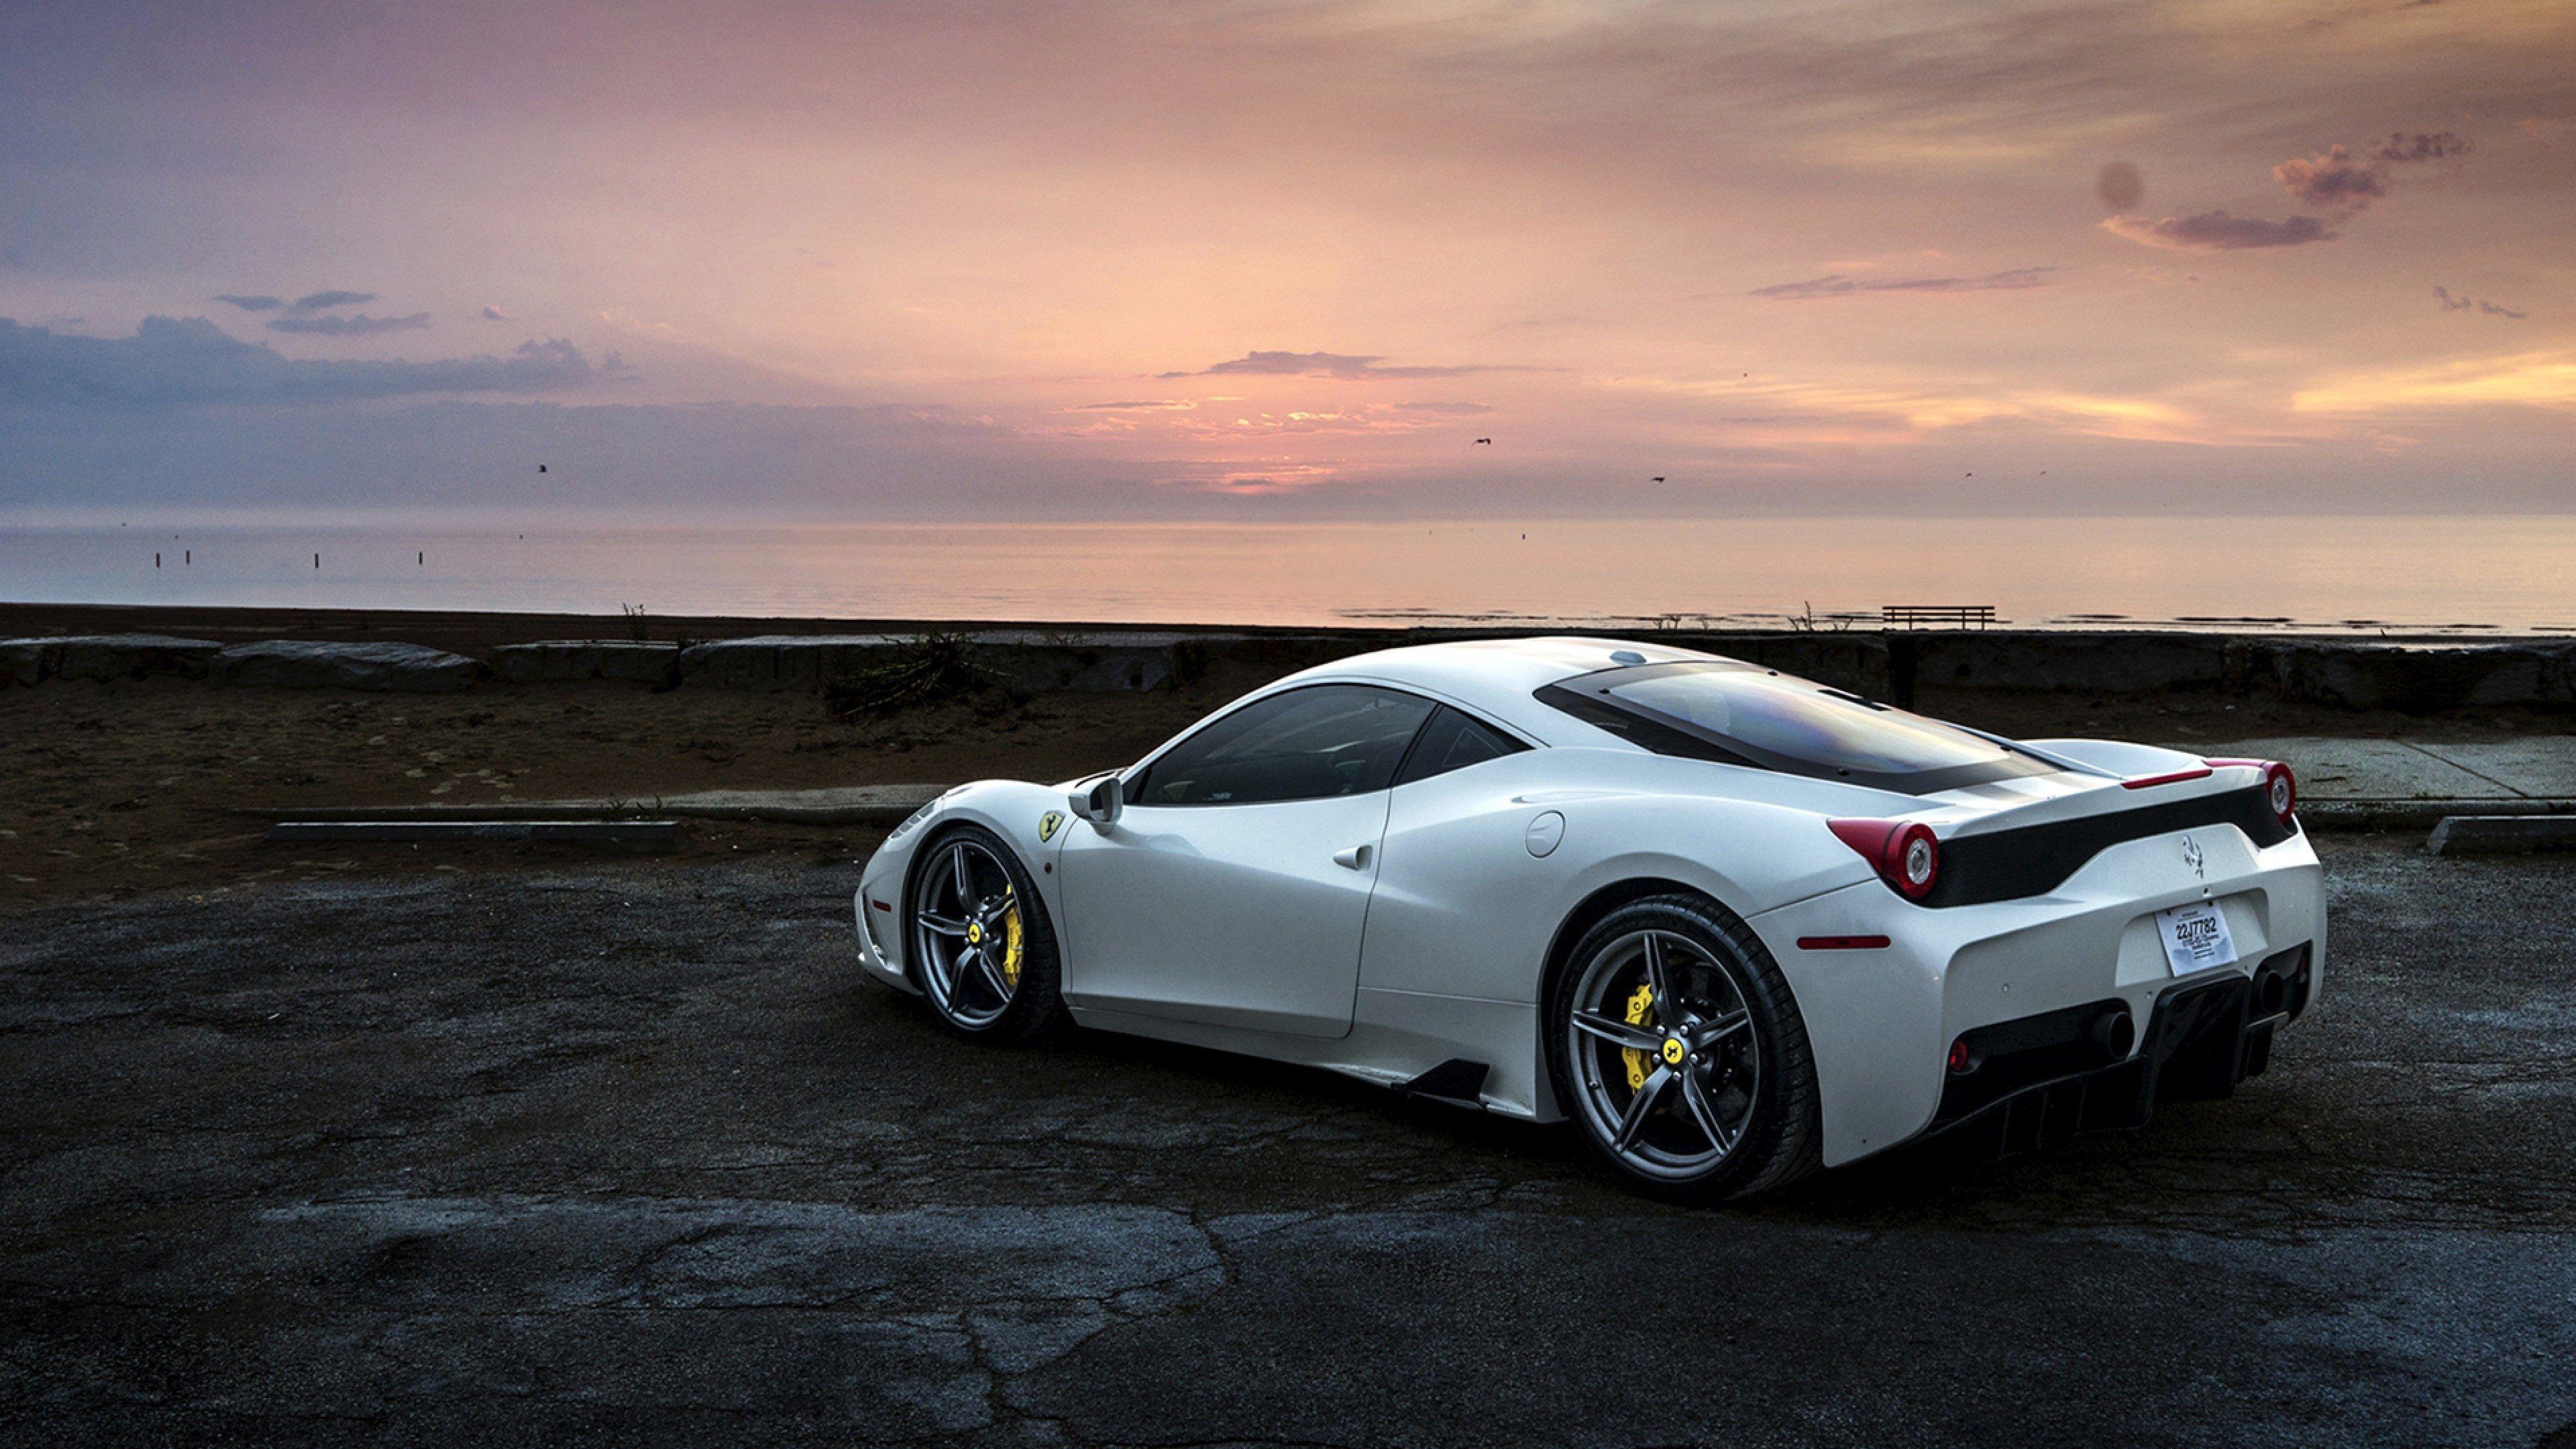 3840x2160 Ferrari 4k Background Wallpaper For Pc Luxury Car Rental Ferrari Car Car Wallpapers